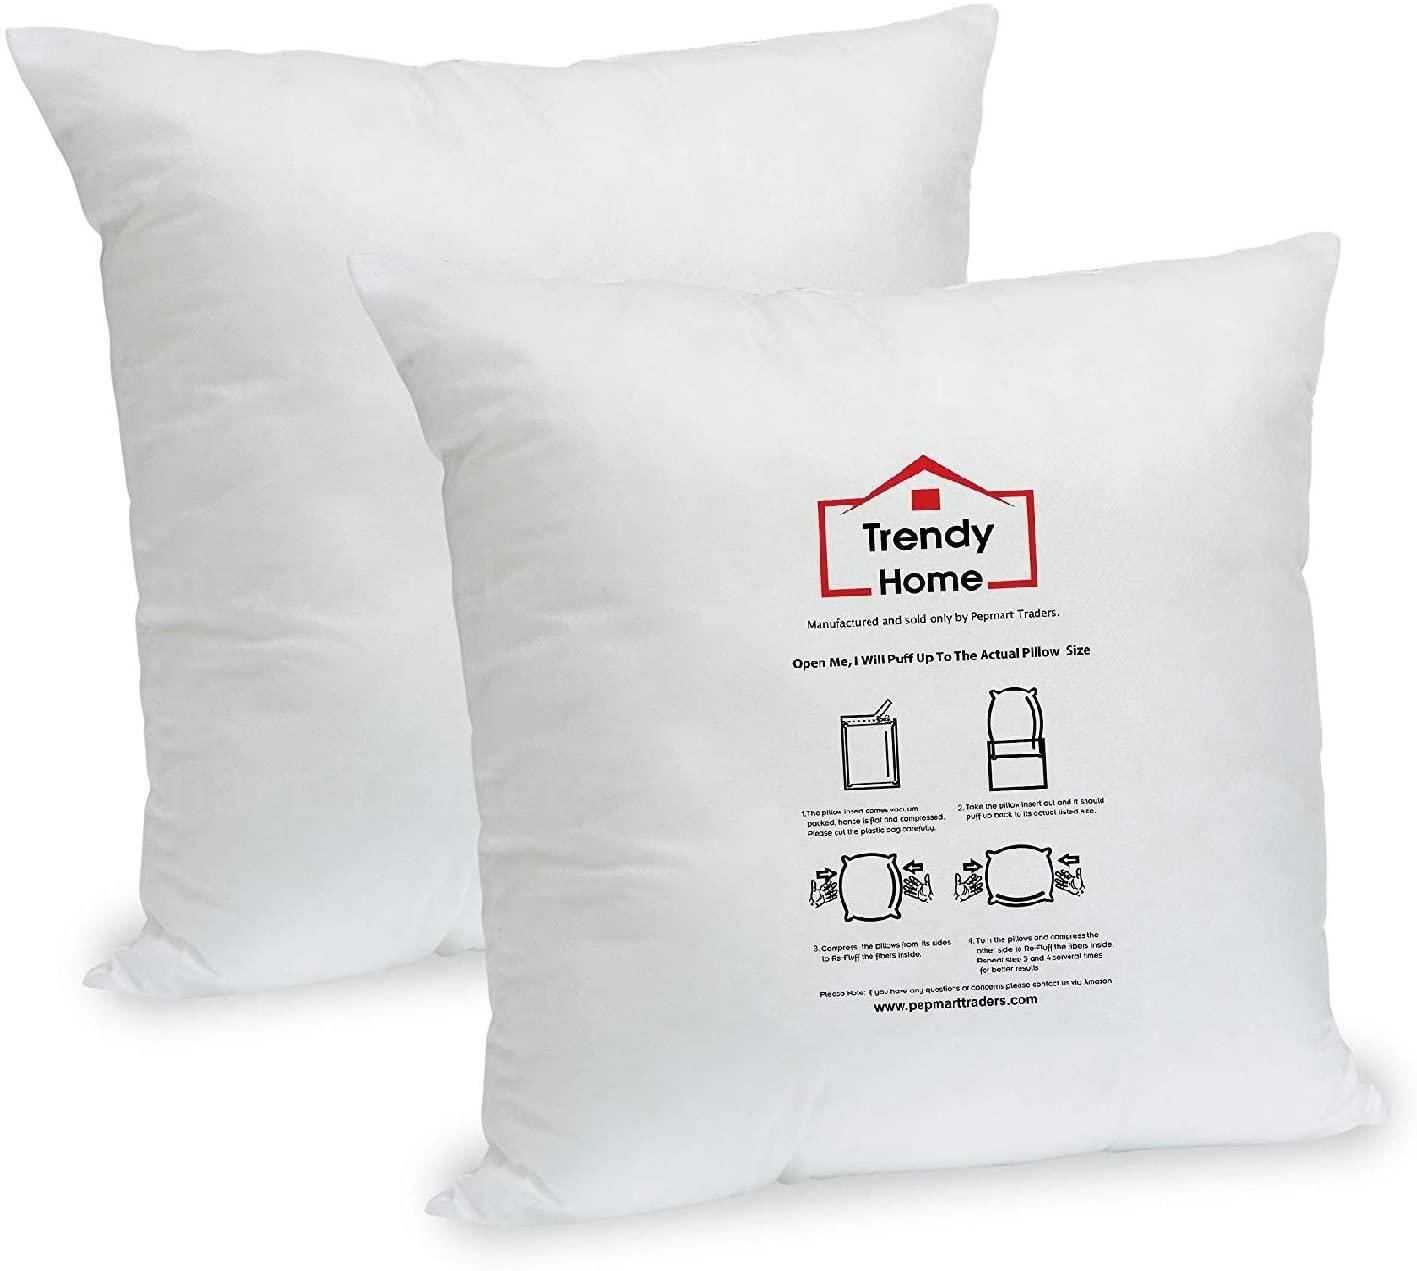 Trendy Home 20x20 Premium Hypoallergenic Stuffer Home Office Decorative Throw Pillow Insert, Standard/White 20x20(2pack)